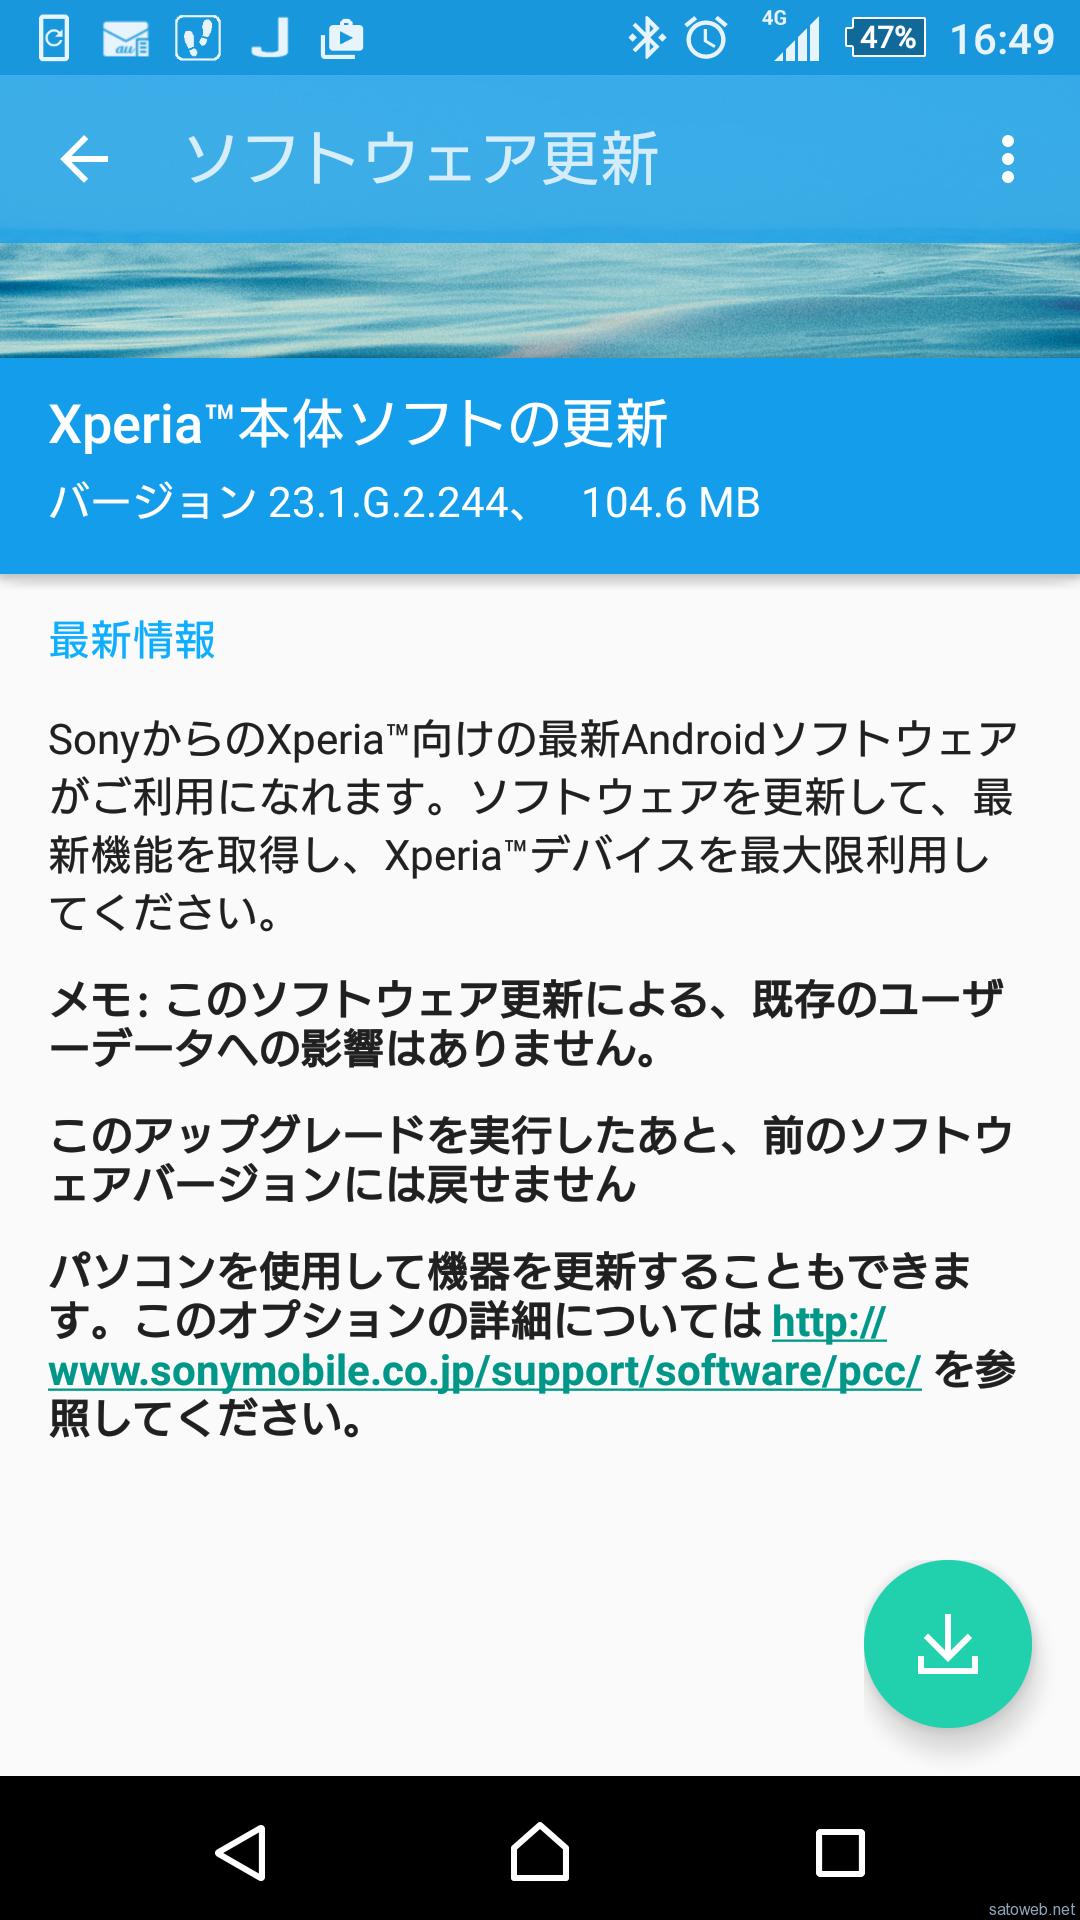 XperiaZ3にソフトウェア更新、電池寿命と引き換えに利用可能時間の短縮の可能性あり。